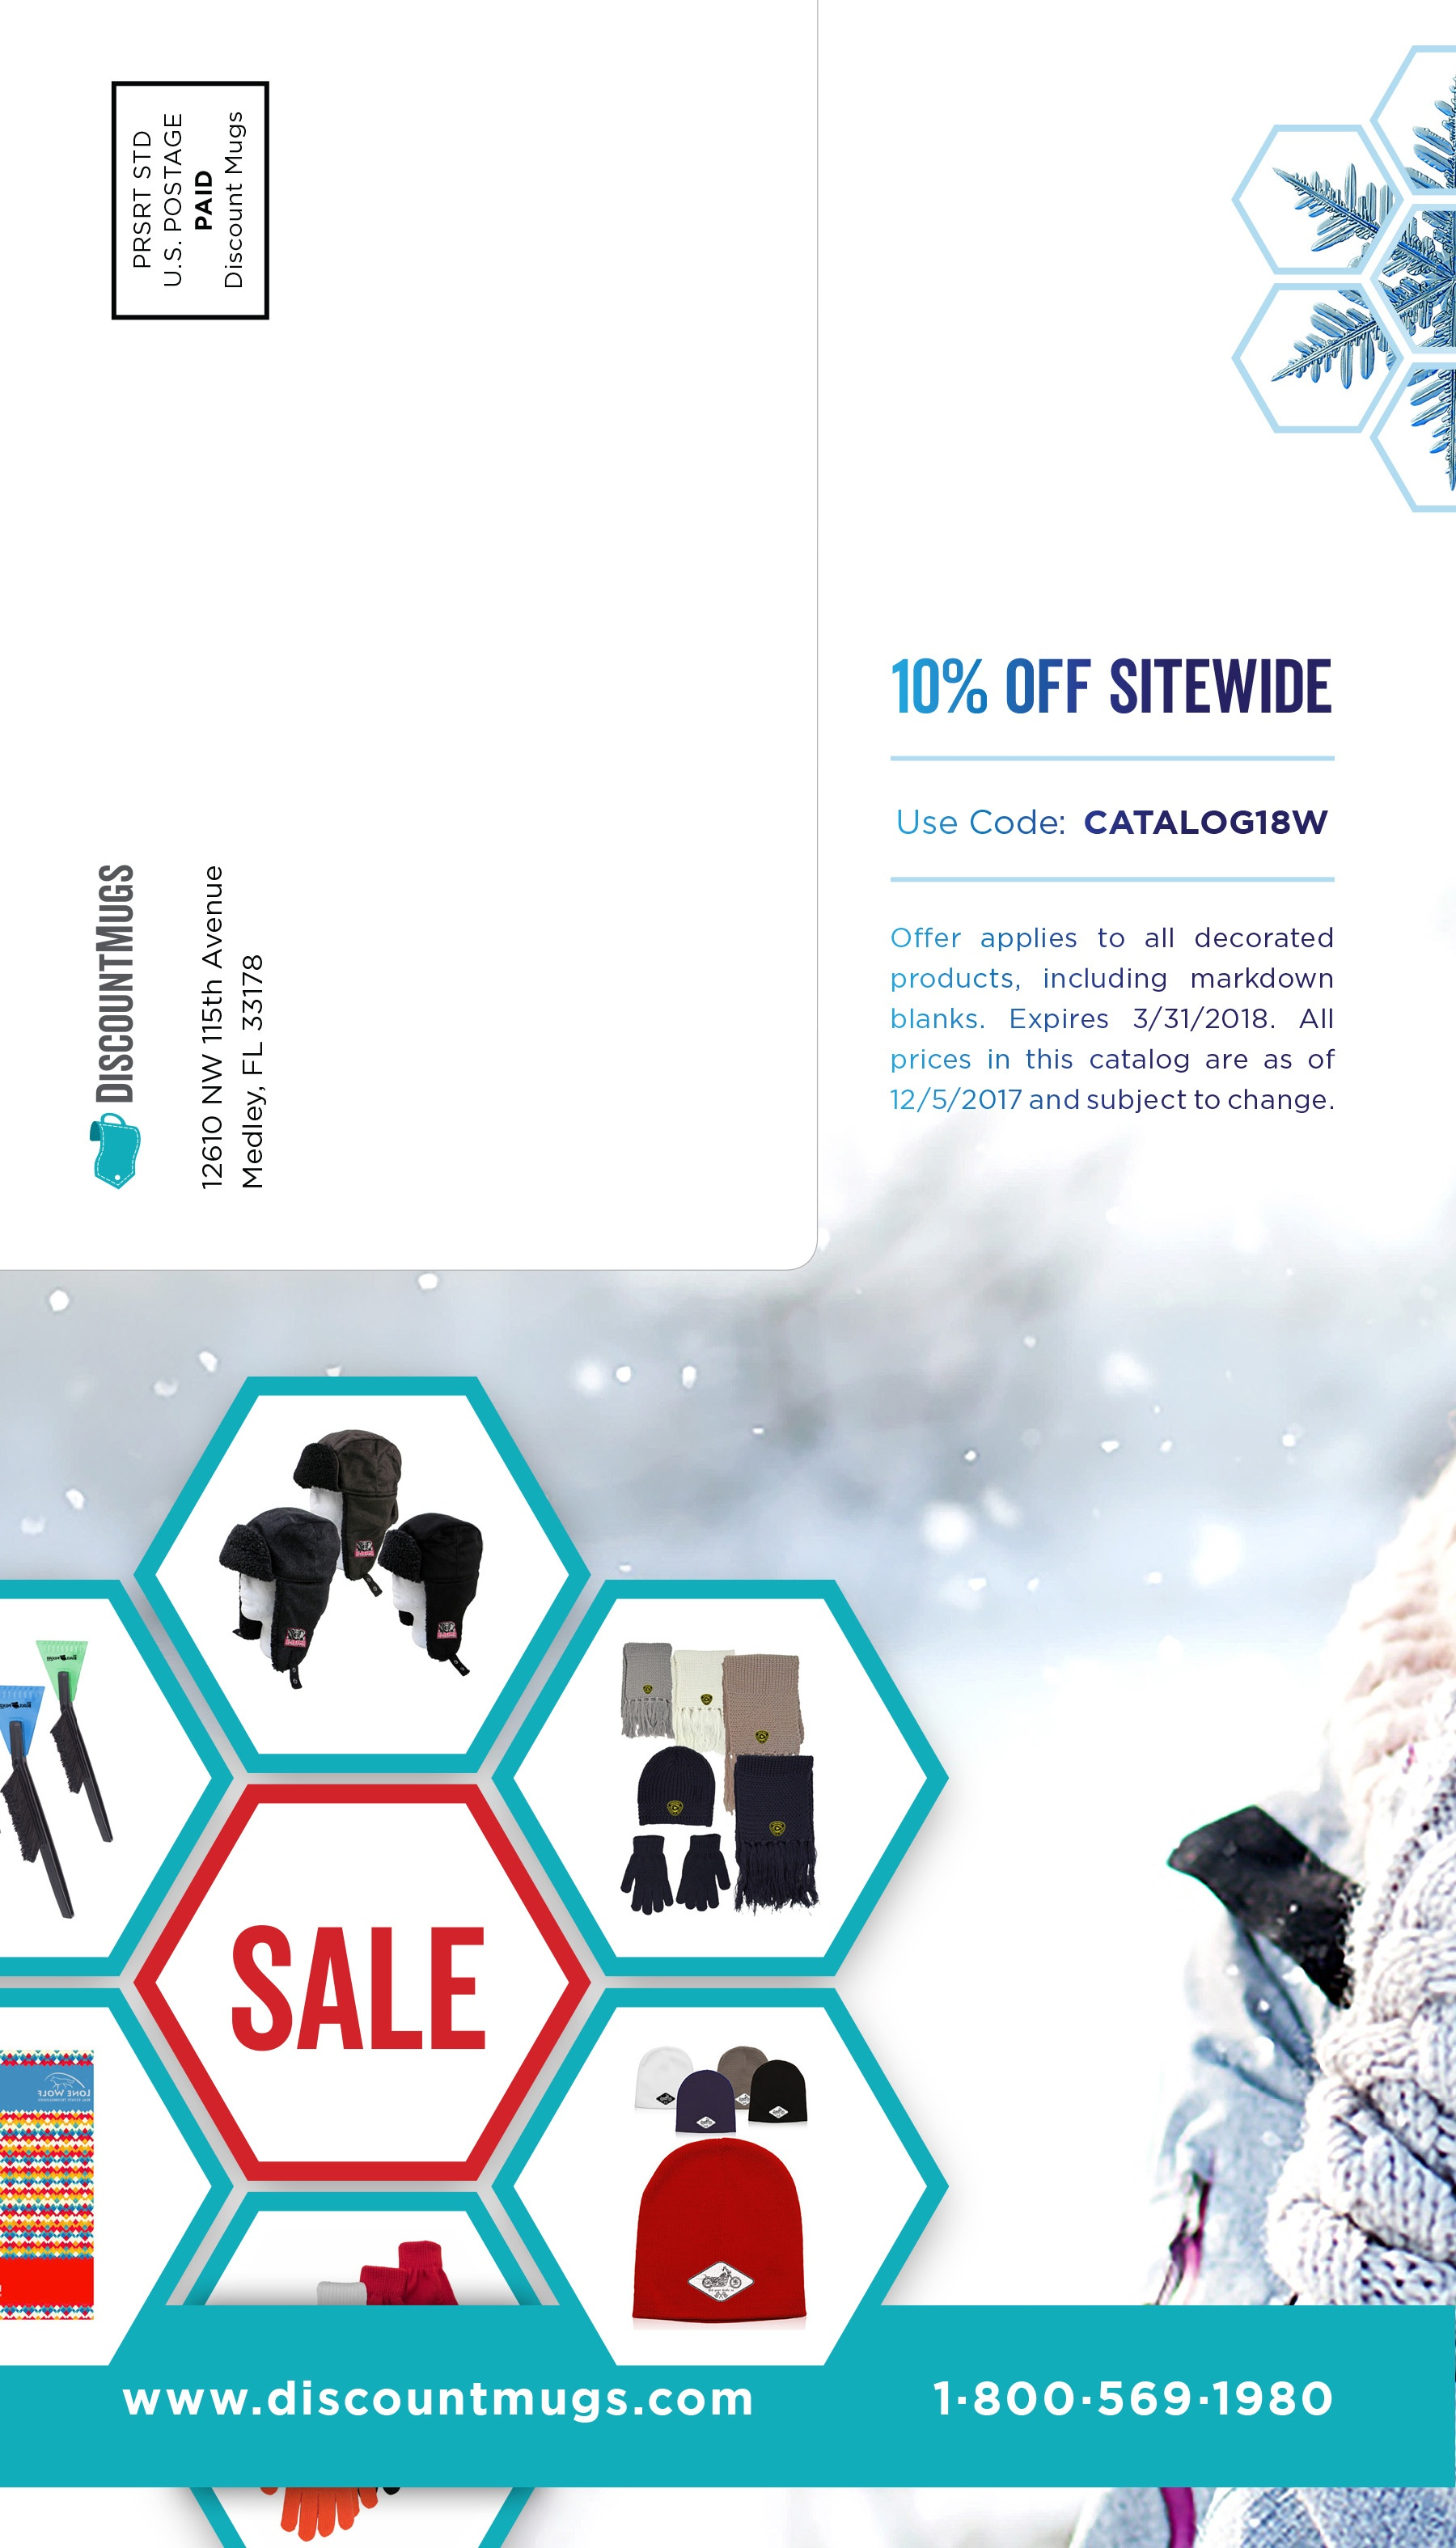 2018 DiscountMugs Winter Catalog_6.jpg